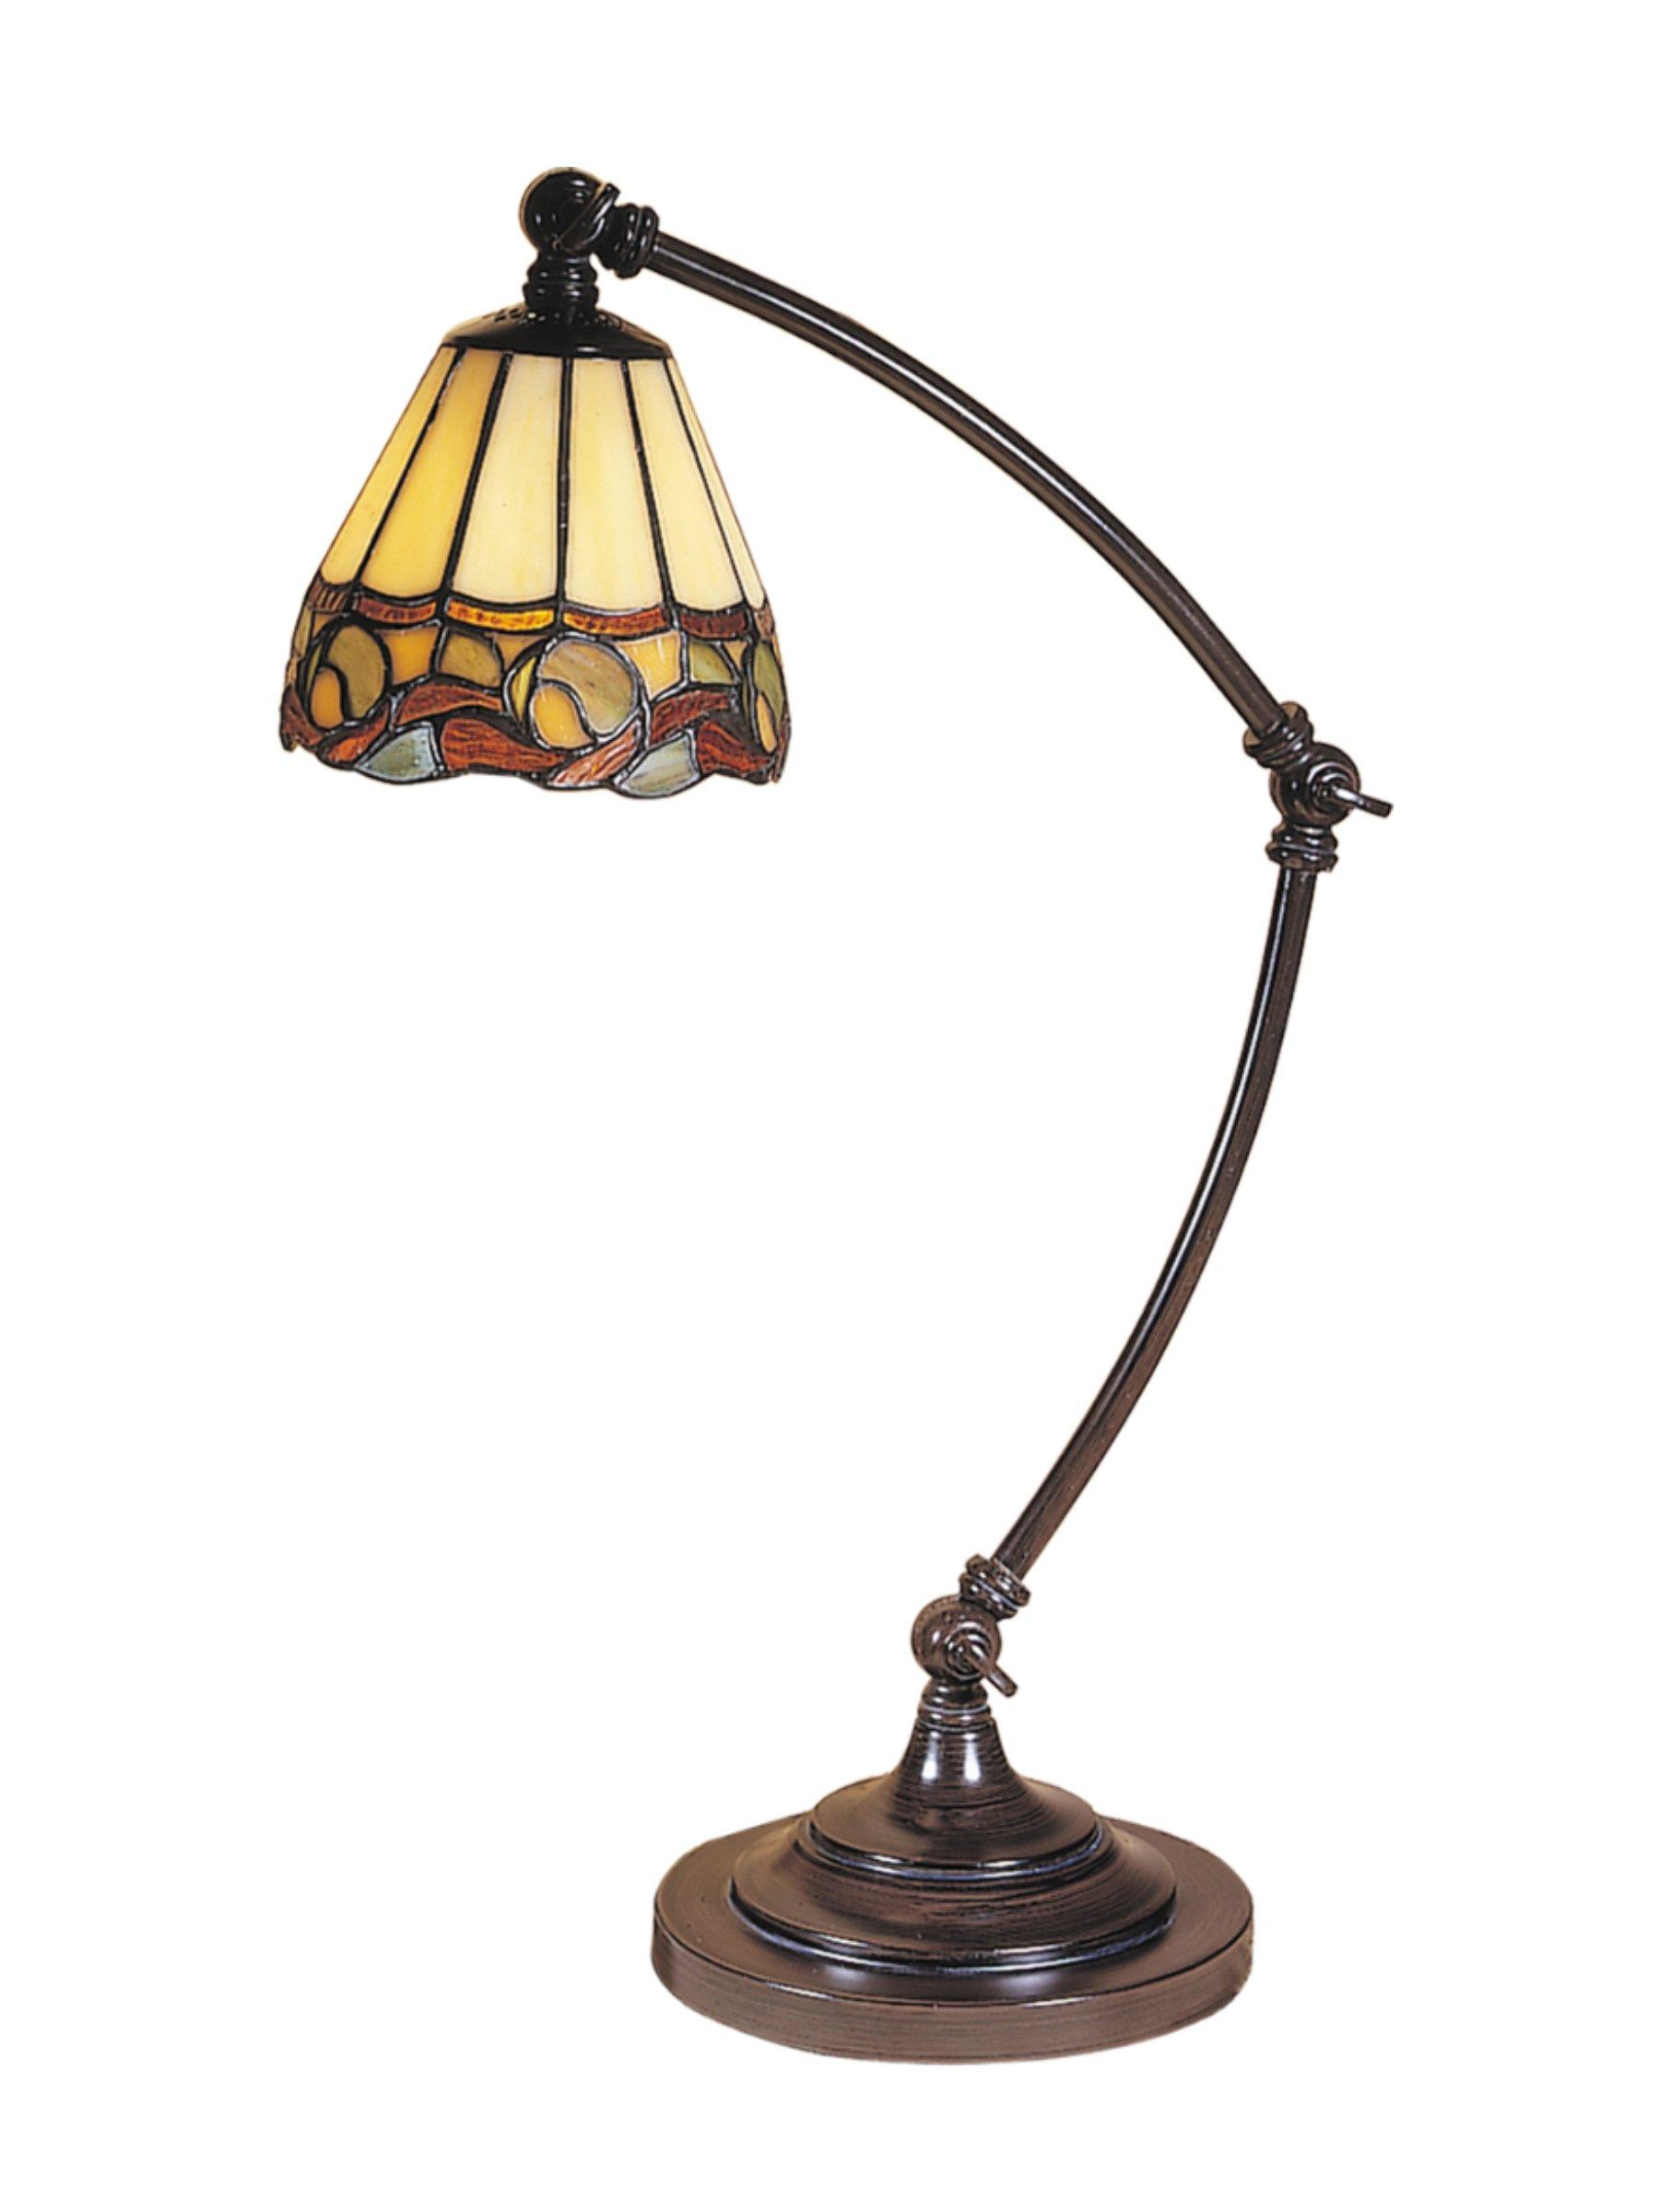 Dale Tiffany TA100700 Ainsley Desk Lamp 5.5'' x 5.5'' x 21'' MICA Bronze